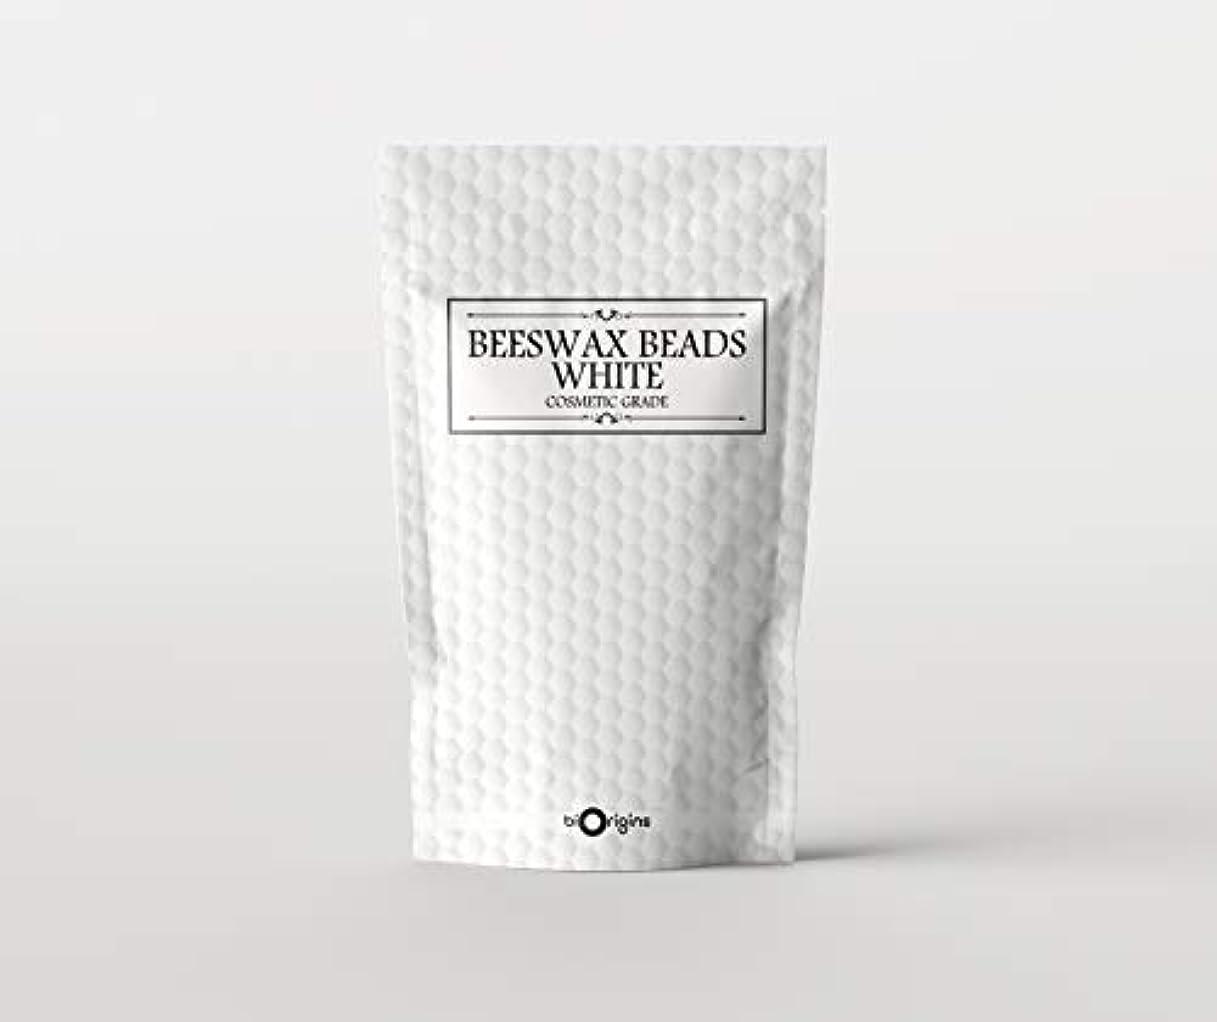 光沢当社純度Beeswax Beads White - Cosmetic Grade - 500g